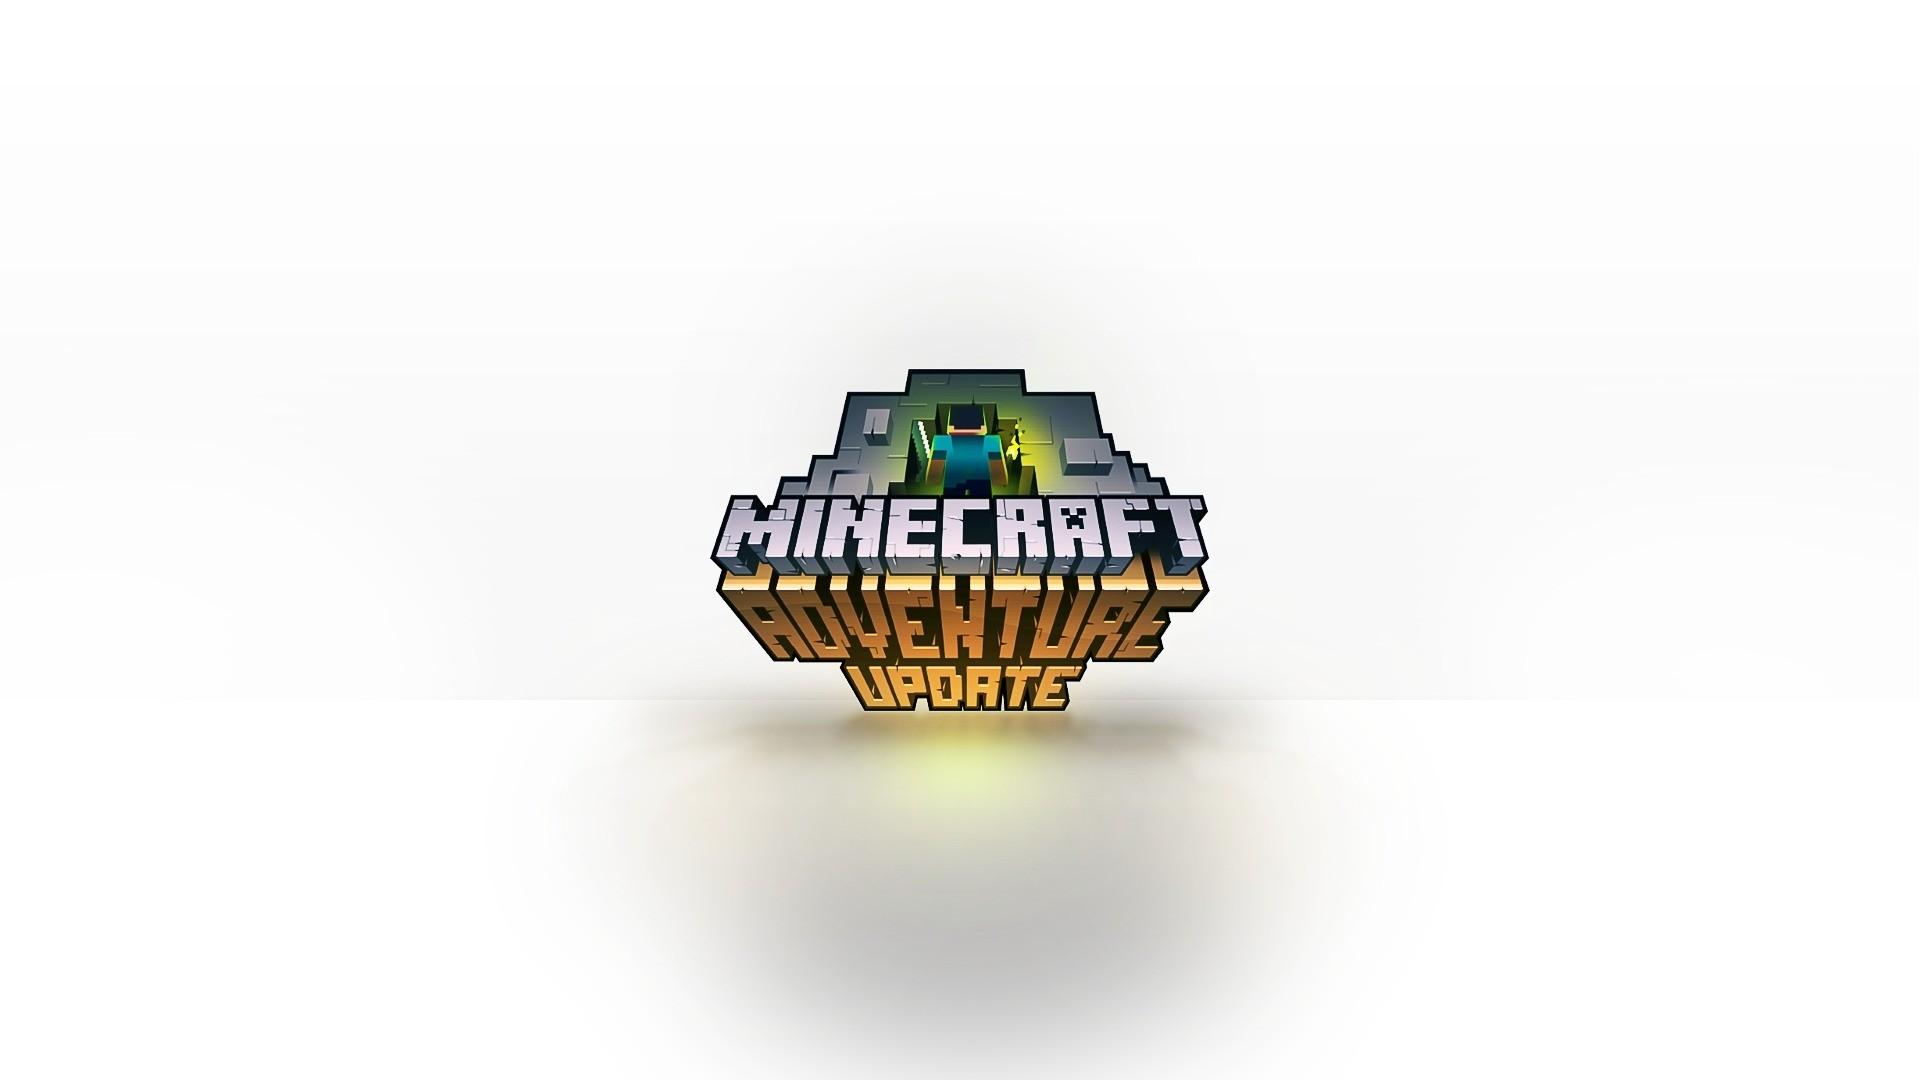 Minecraft Minimalist wallpaper for pc